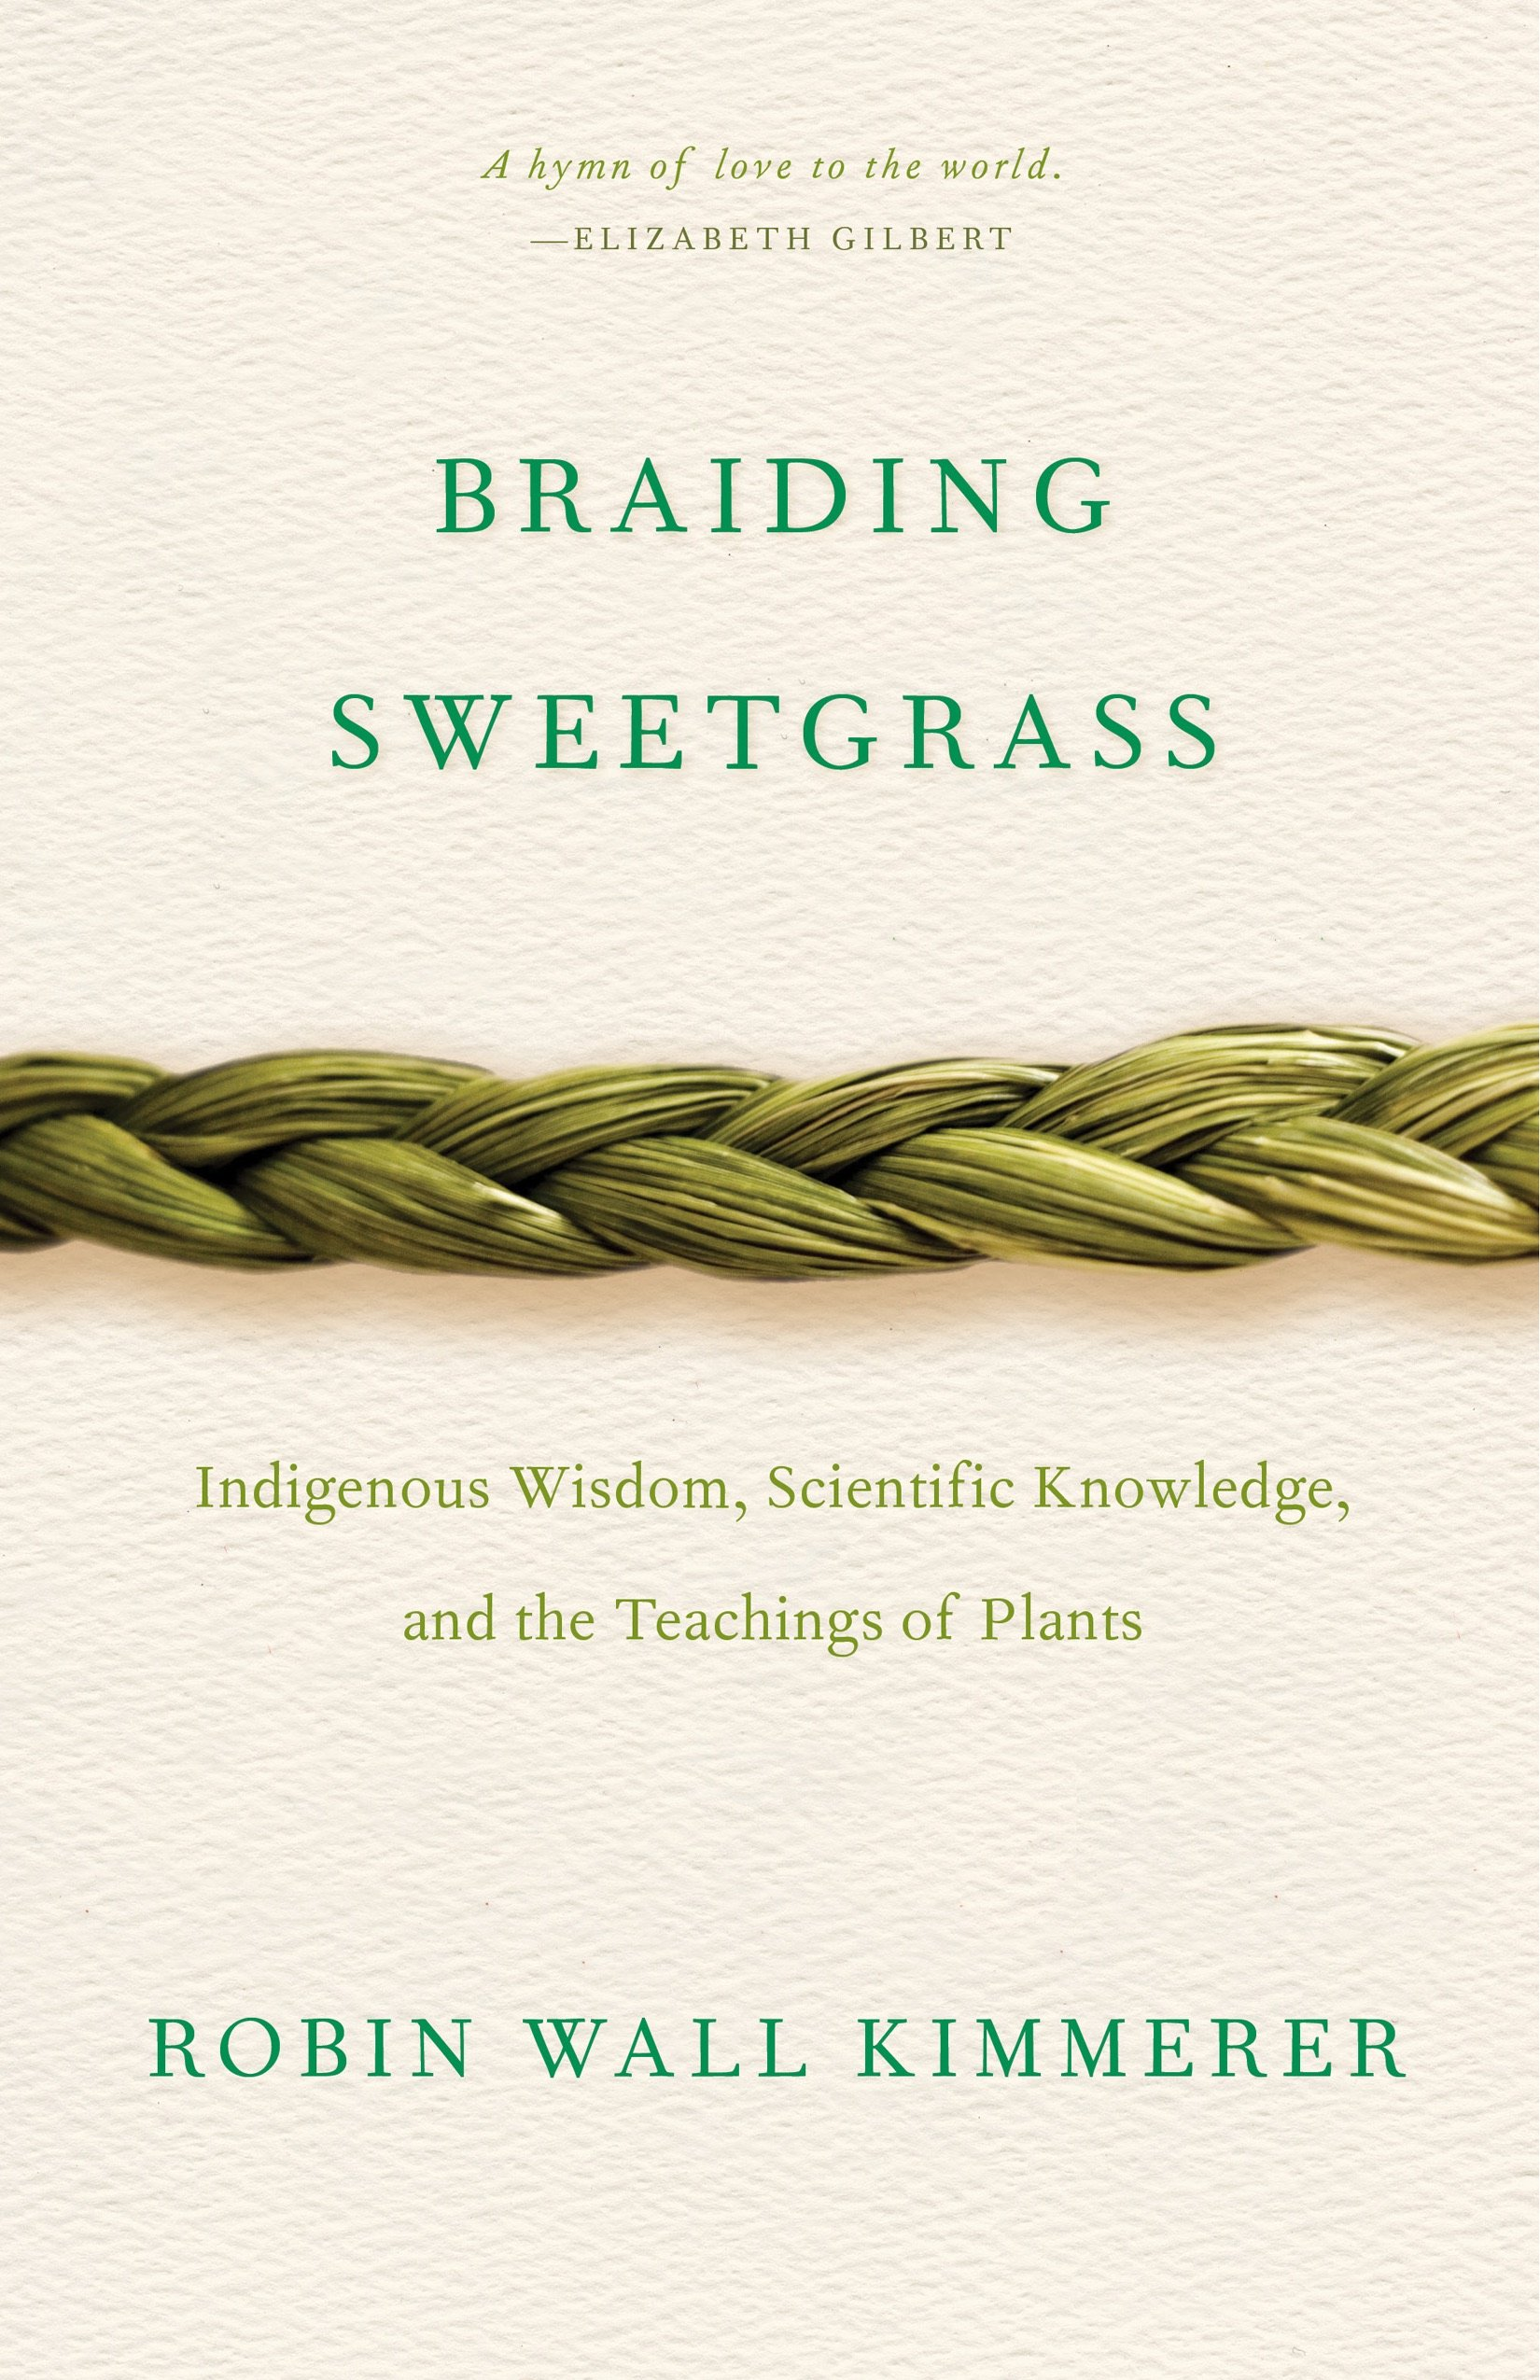 Robin Wall Kimmerer, Braiding Sweetgrass